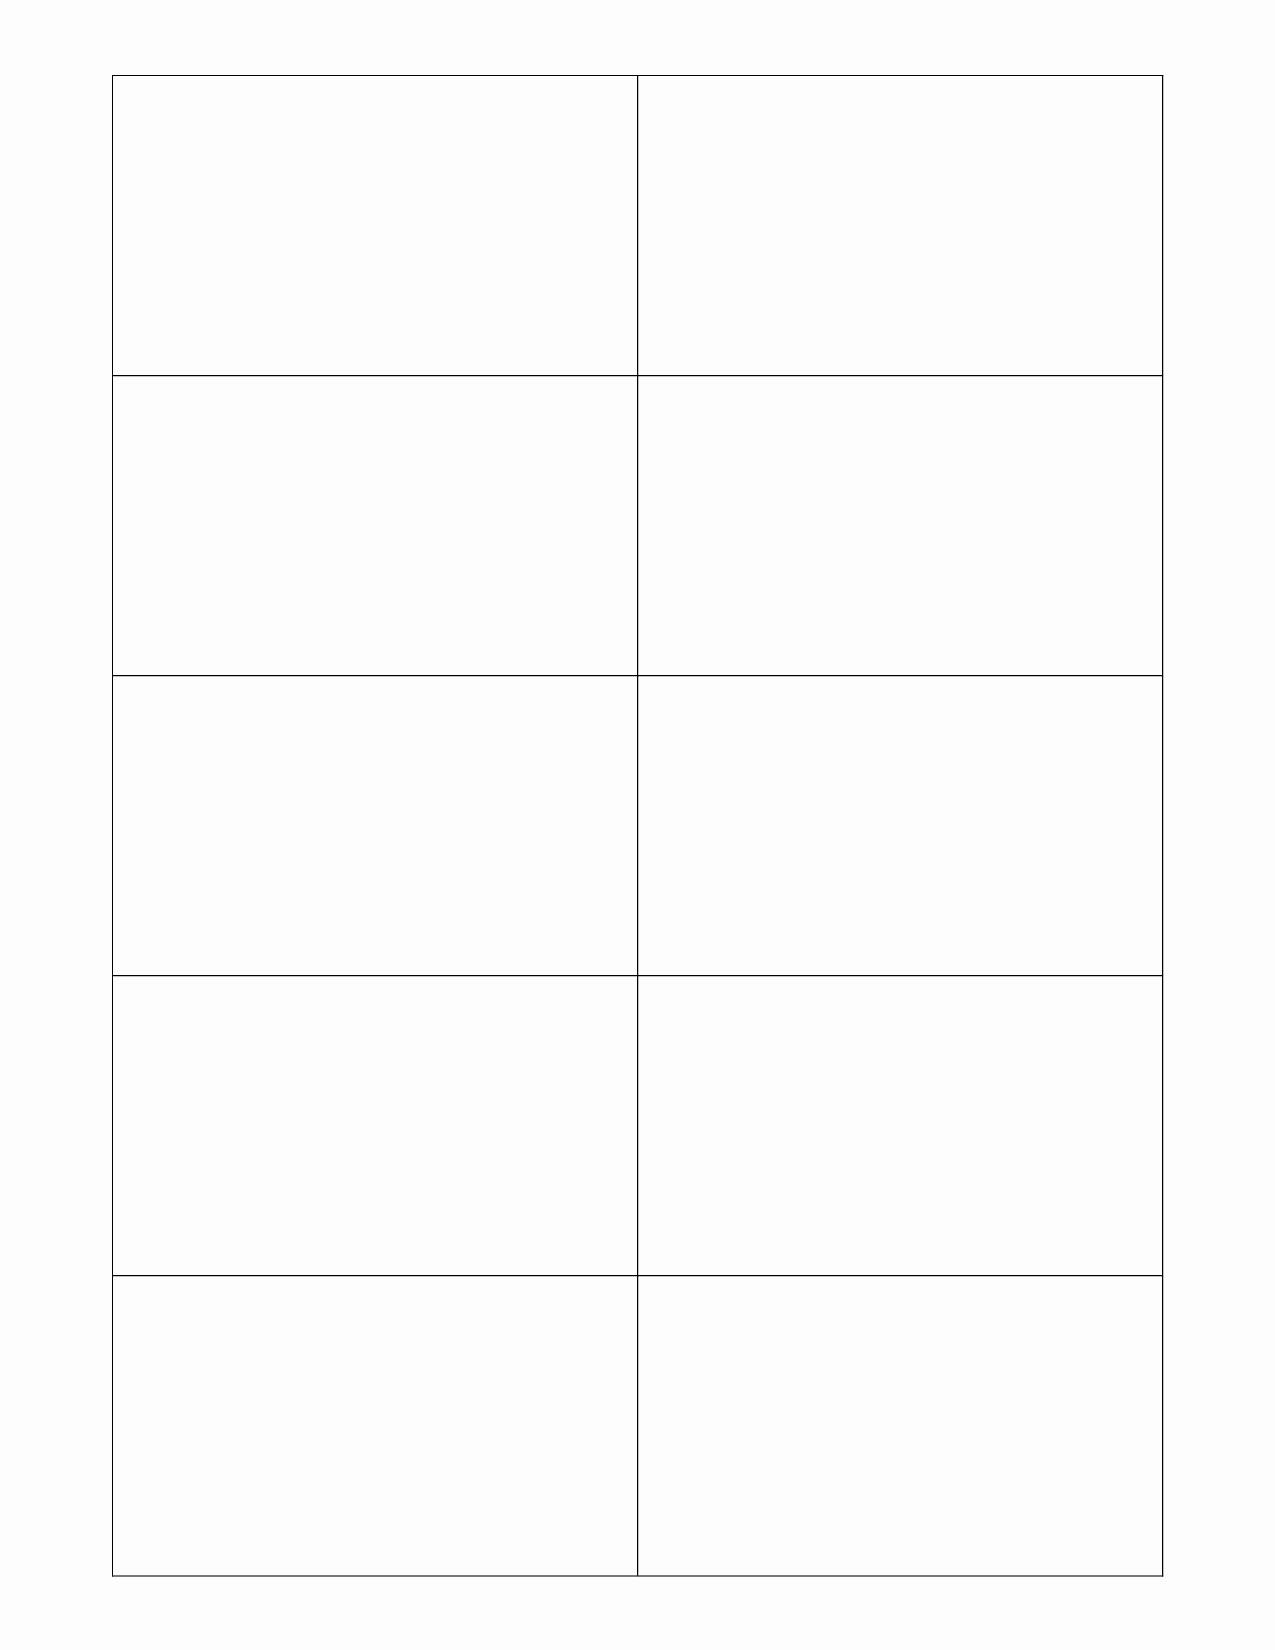 Microsoft Business Card Template Free Elegant Blank Business Card Template Beepmunk